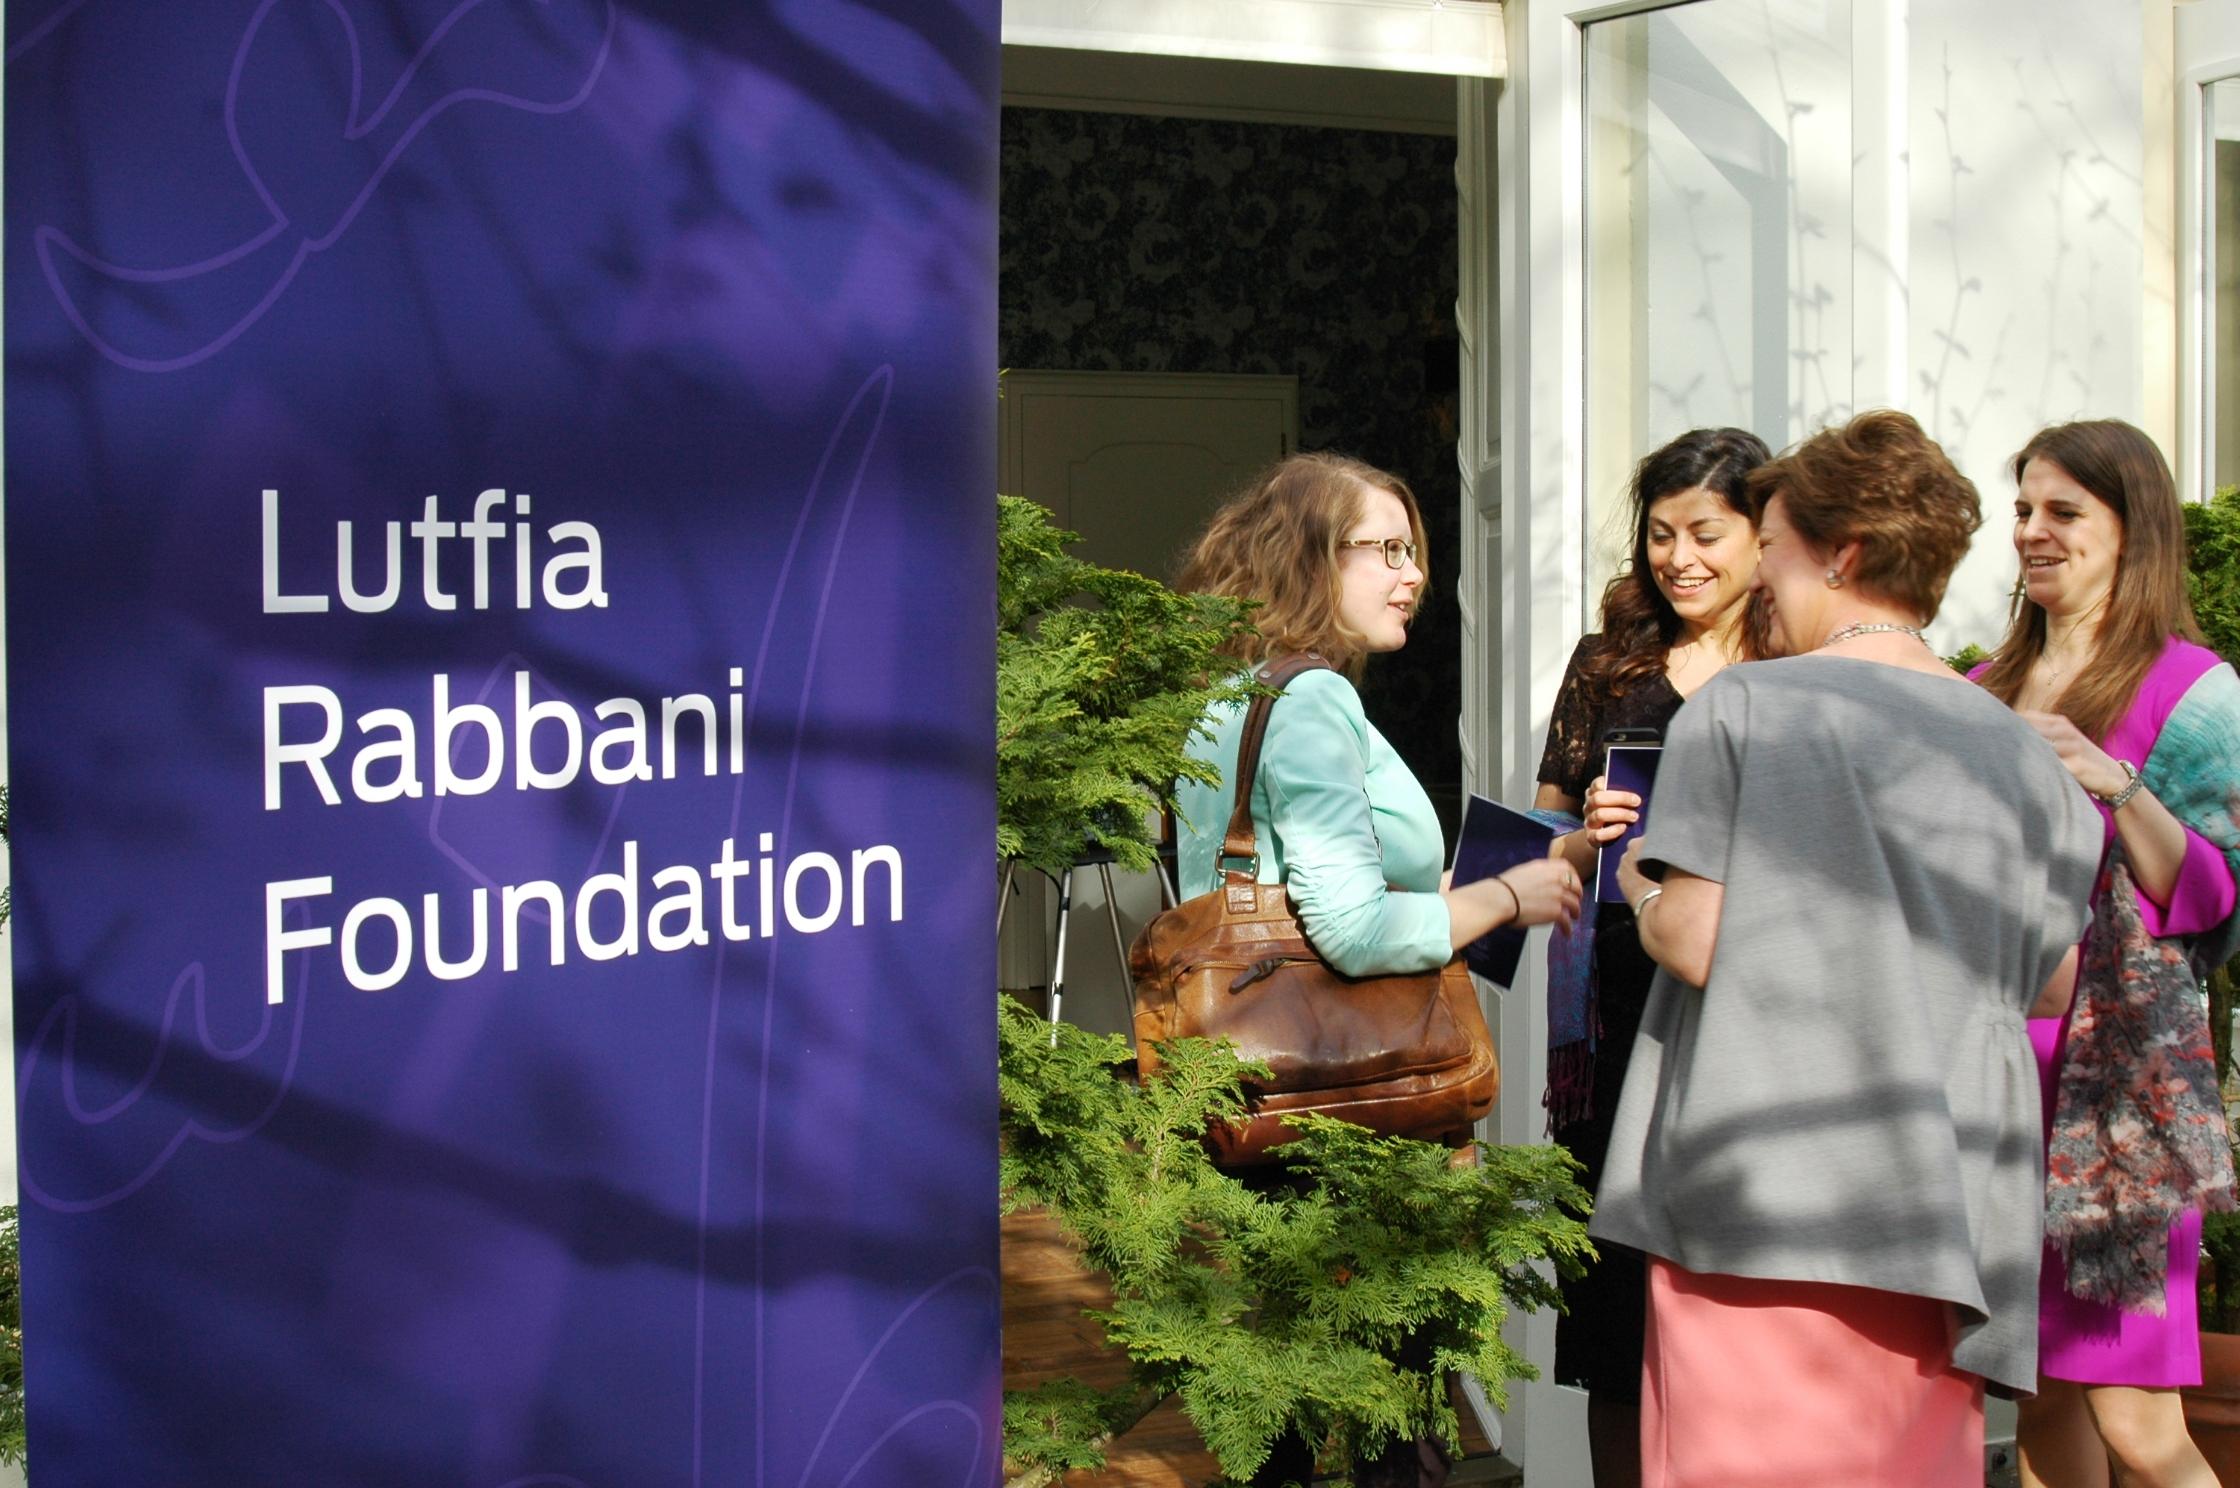 Lutfia Rabbani Foundation Mahmoud S. Rabbani Scholarship 2019/2020 (Up to €15,000)